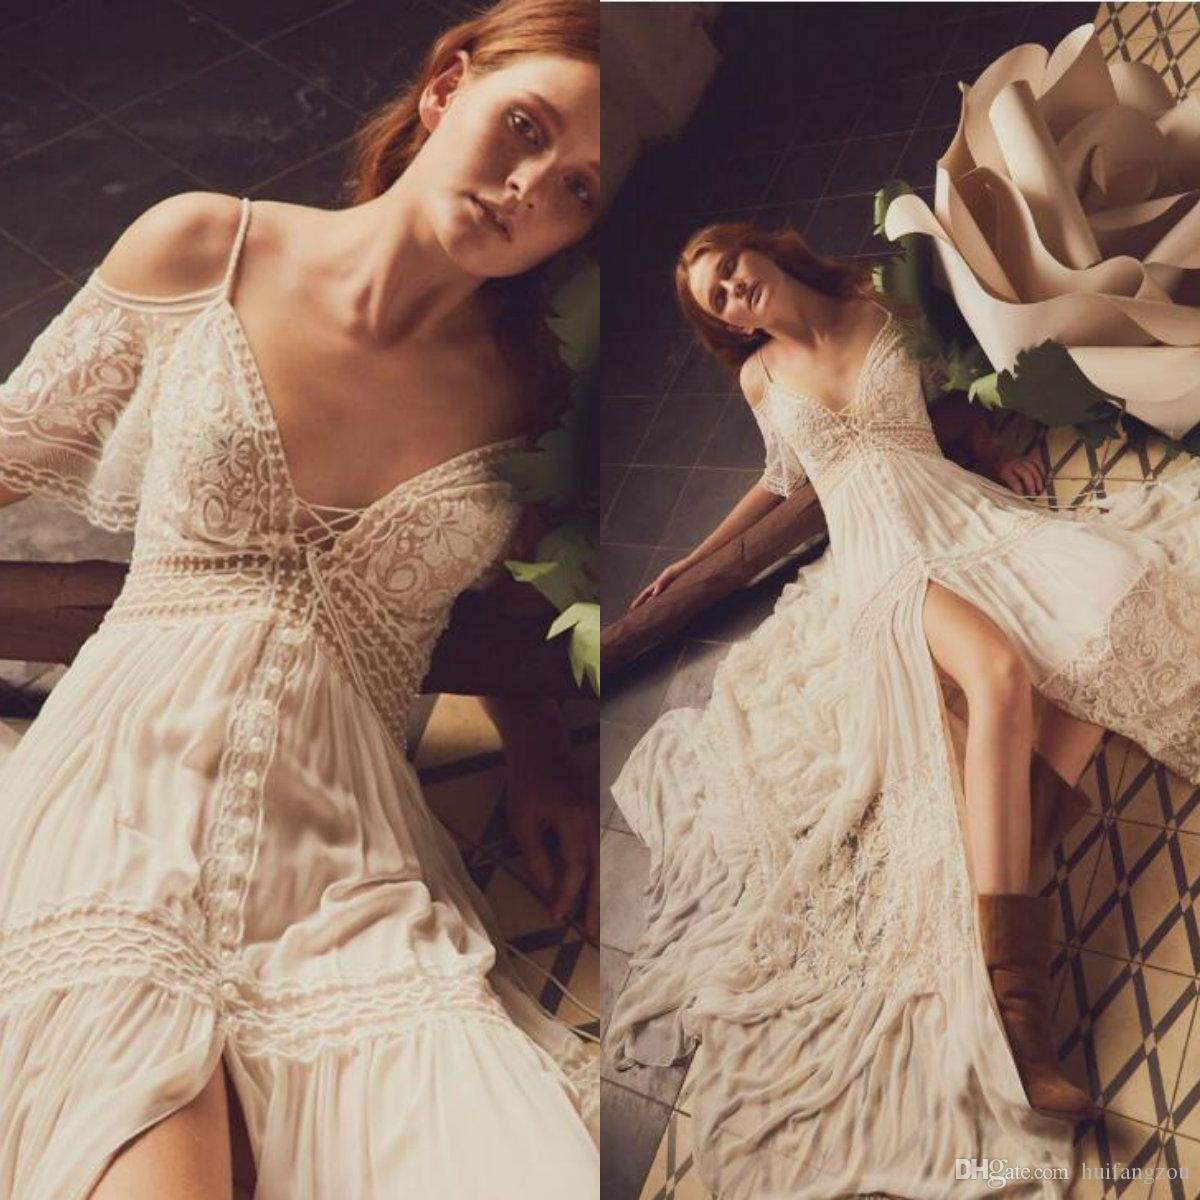 Inbal Raviv Boho Wedding Dresses Crochet Lace Chiffon Flowing Flare Greek Bohemian Bridal Dress Custom Made Beach Wedding Gowns